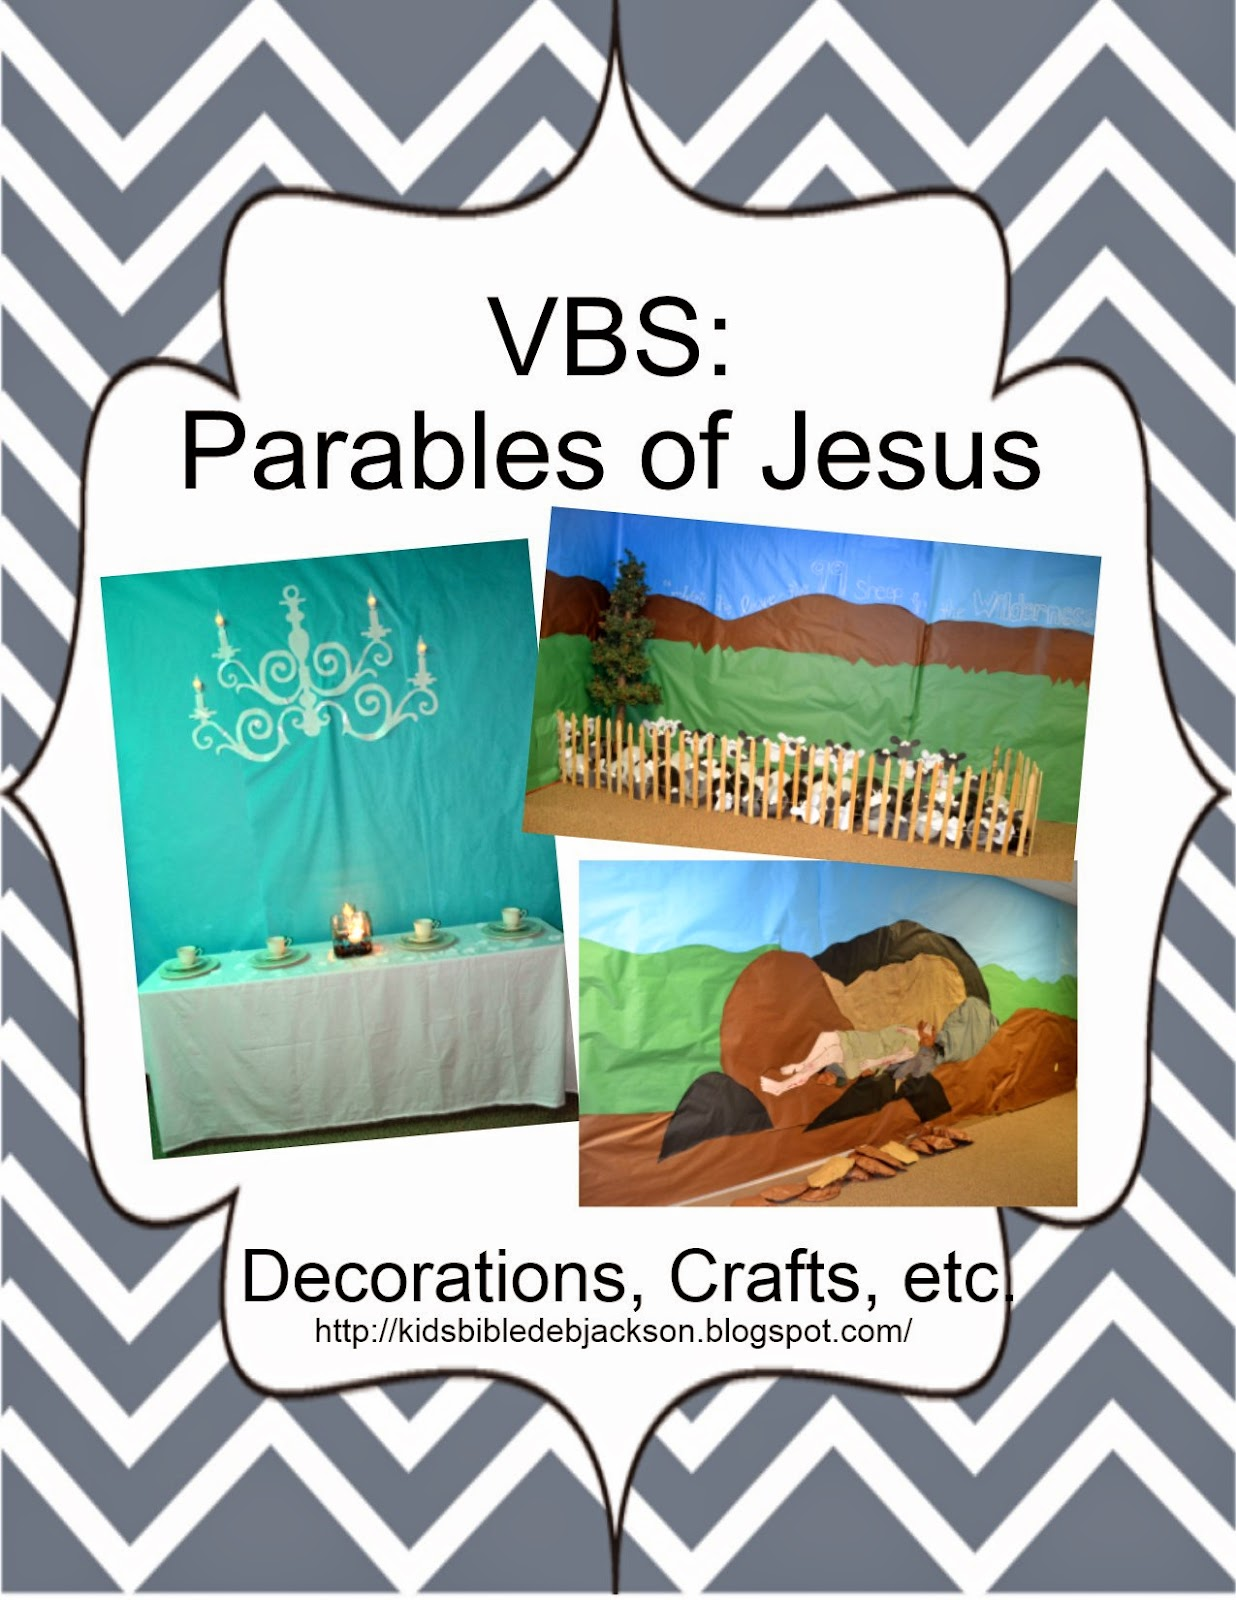 http://kidsbibledebjackson.blogspot.com/2014/06/parables-of-jesus-vbs.html